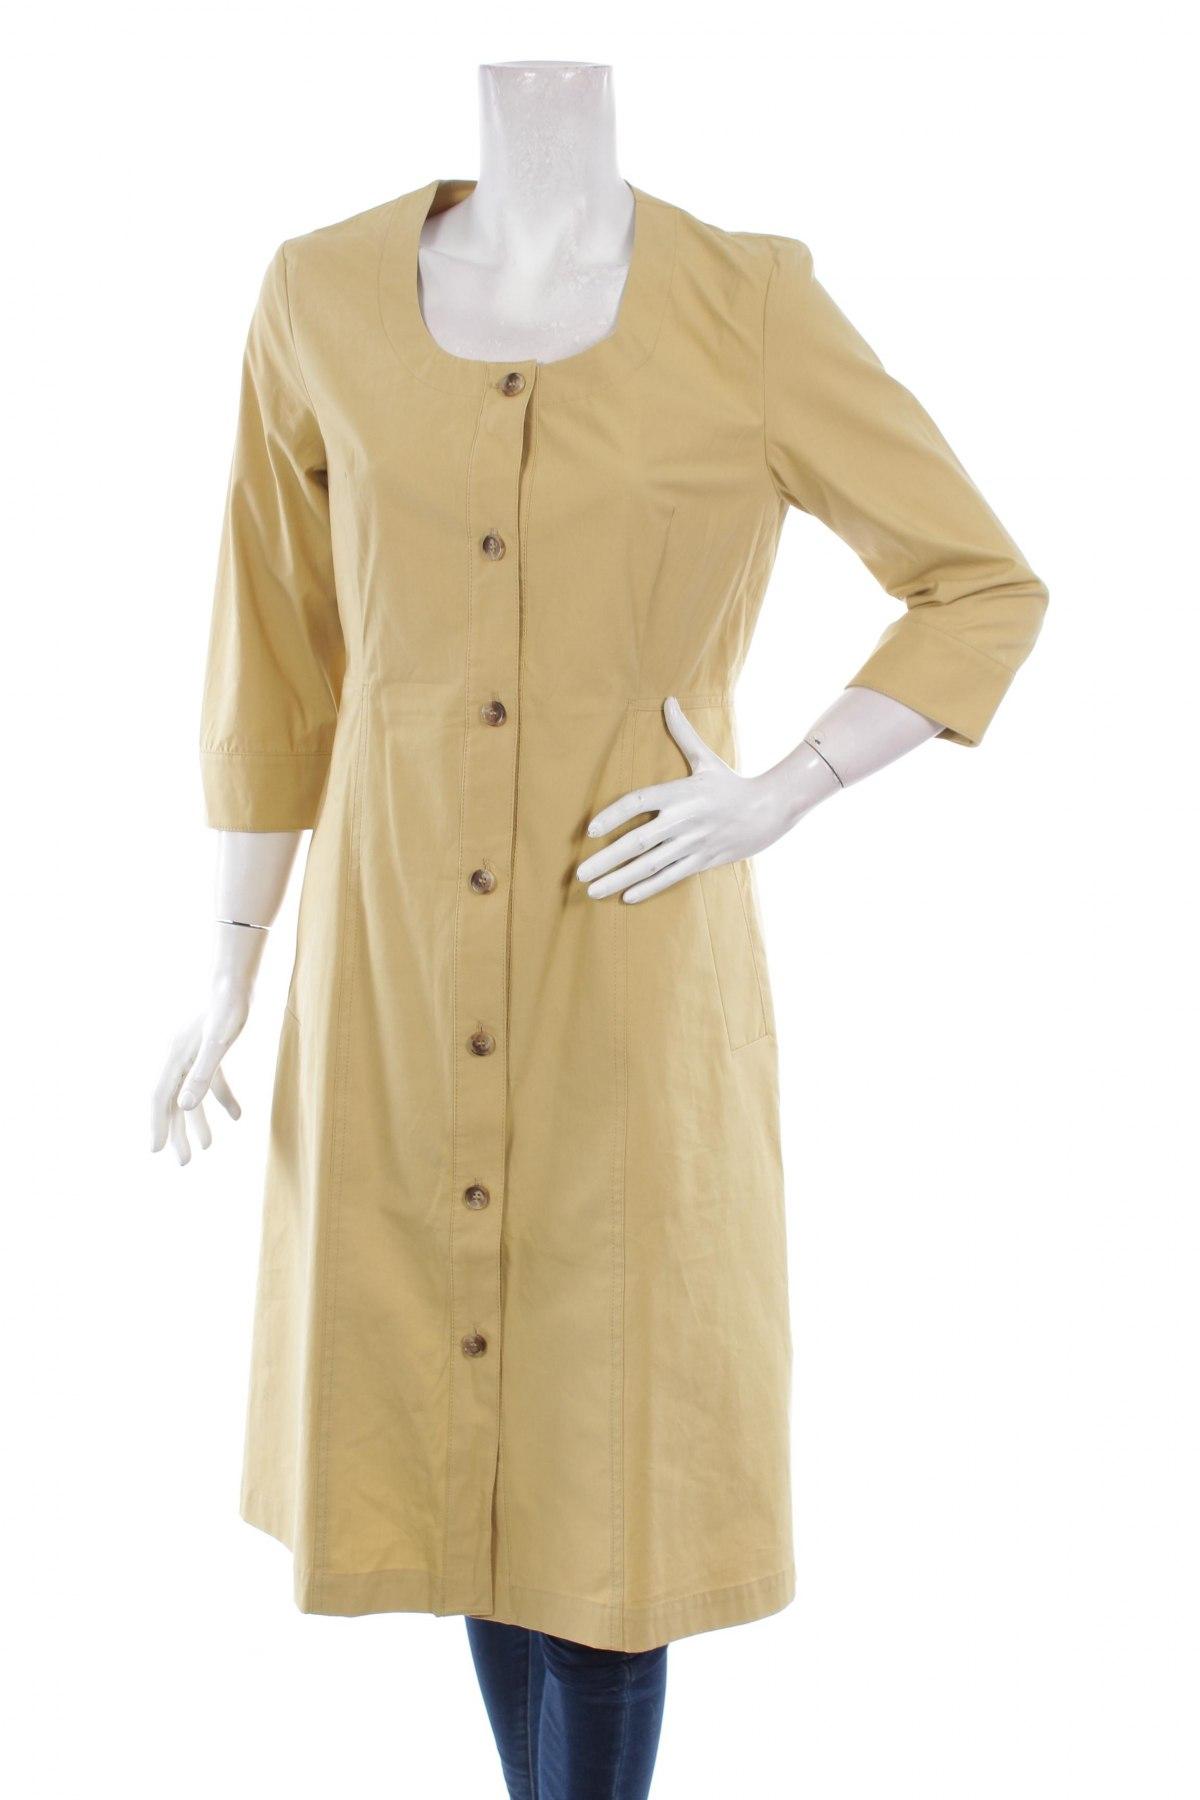 355d6b6aec3 Γυναικείο παλτό Cos - σε συμφέρουσα τιμή στο Remix - #102834666